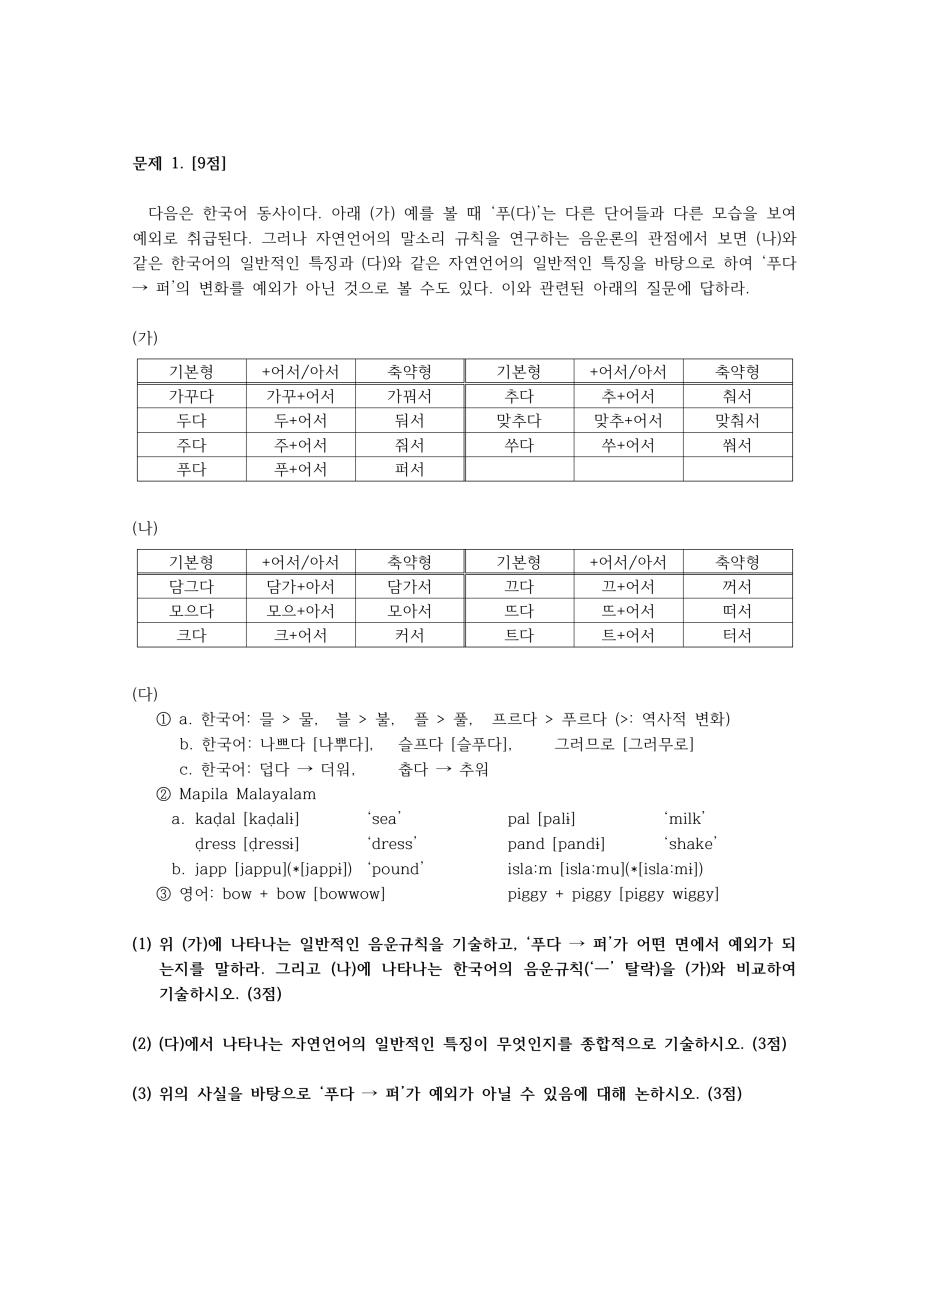 klo-2017-02